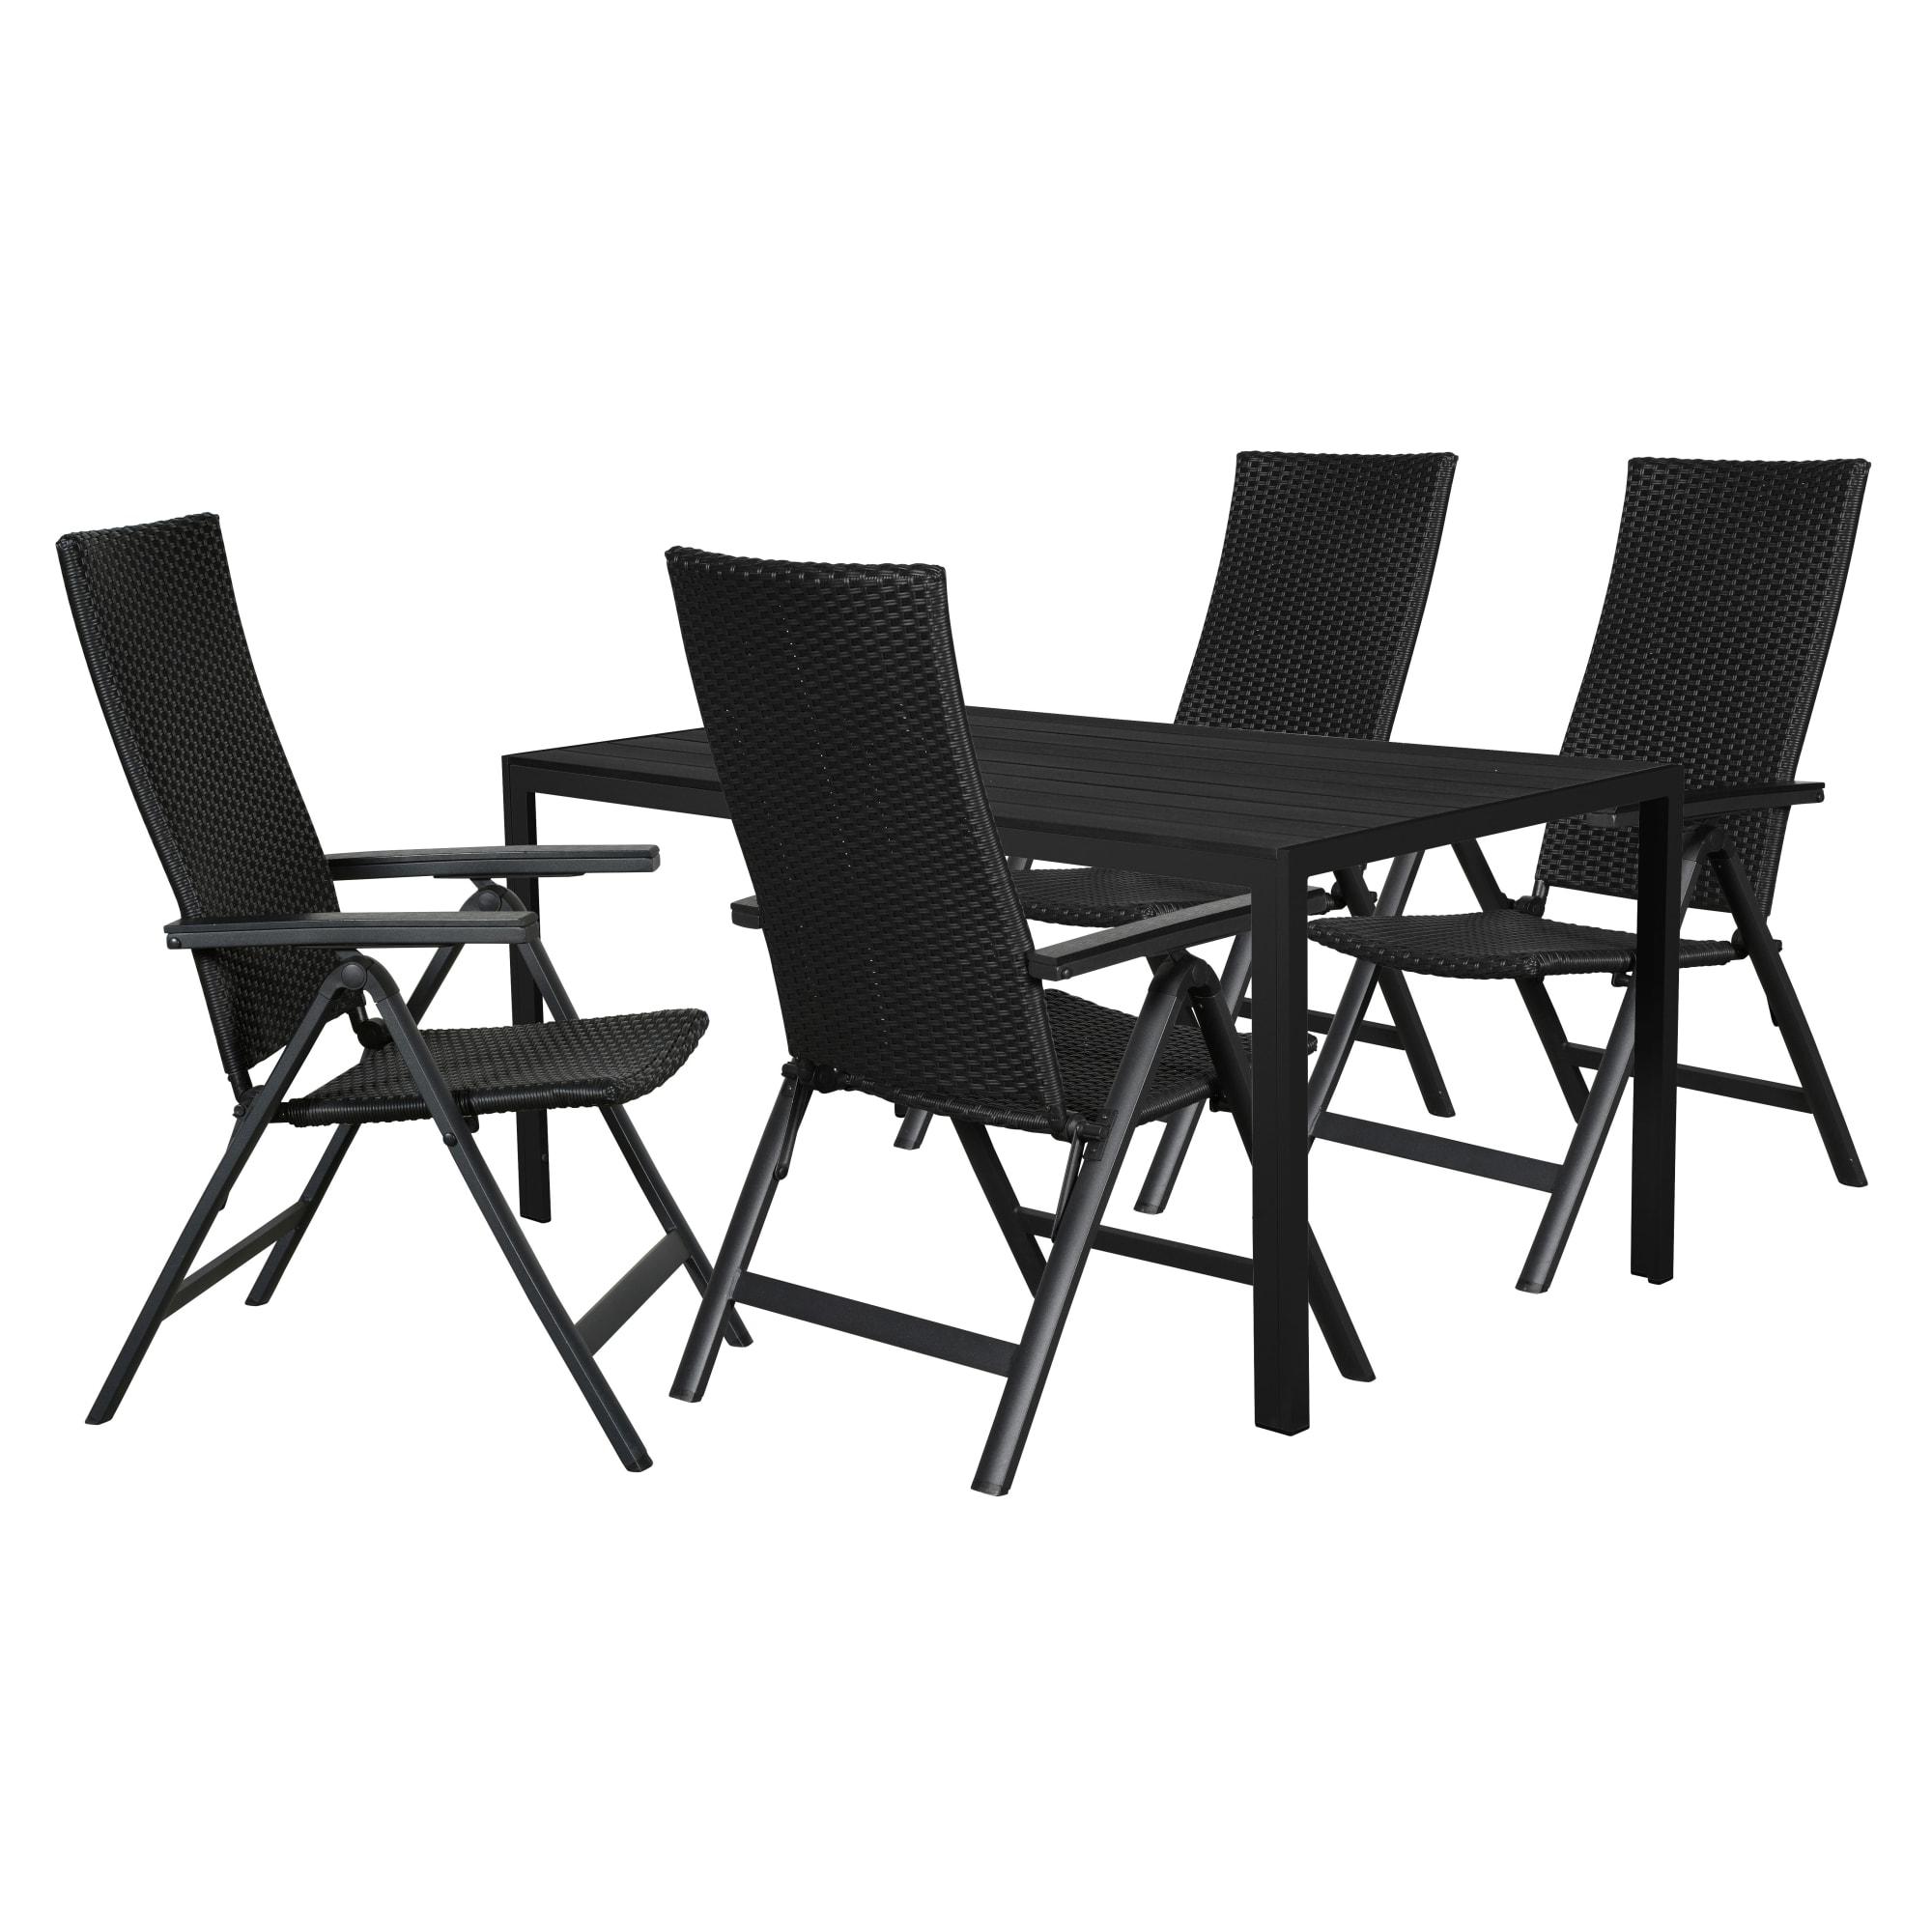 Bord (L 150 cm) og positionsstole